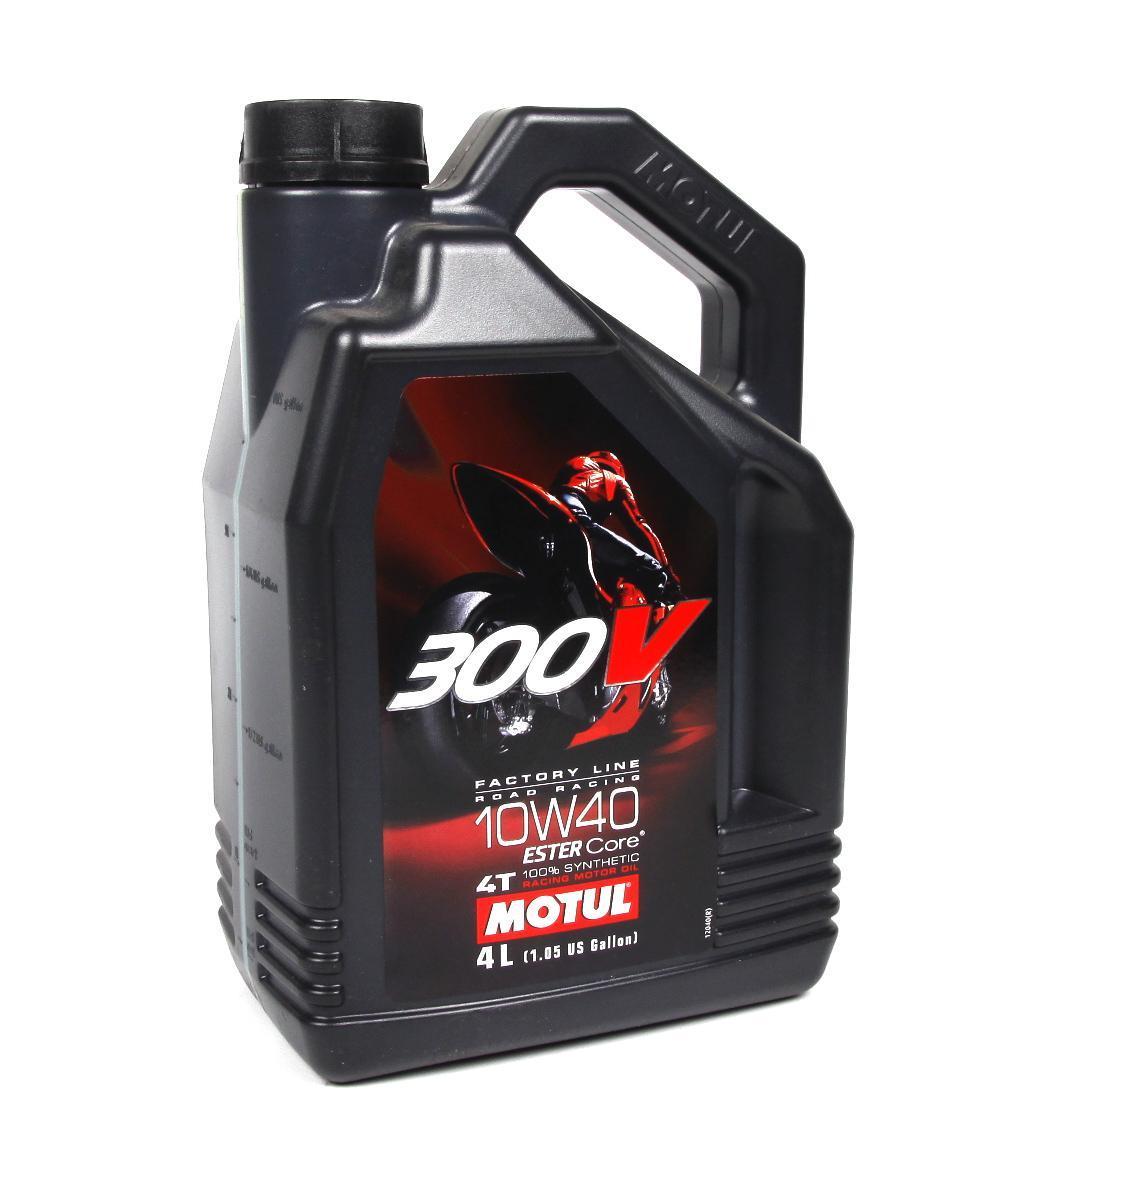 Моторное масло MOTUL 300V FACTORY LINE ROAD RACING 10W40 4T (4л)